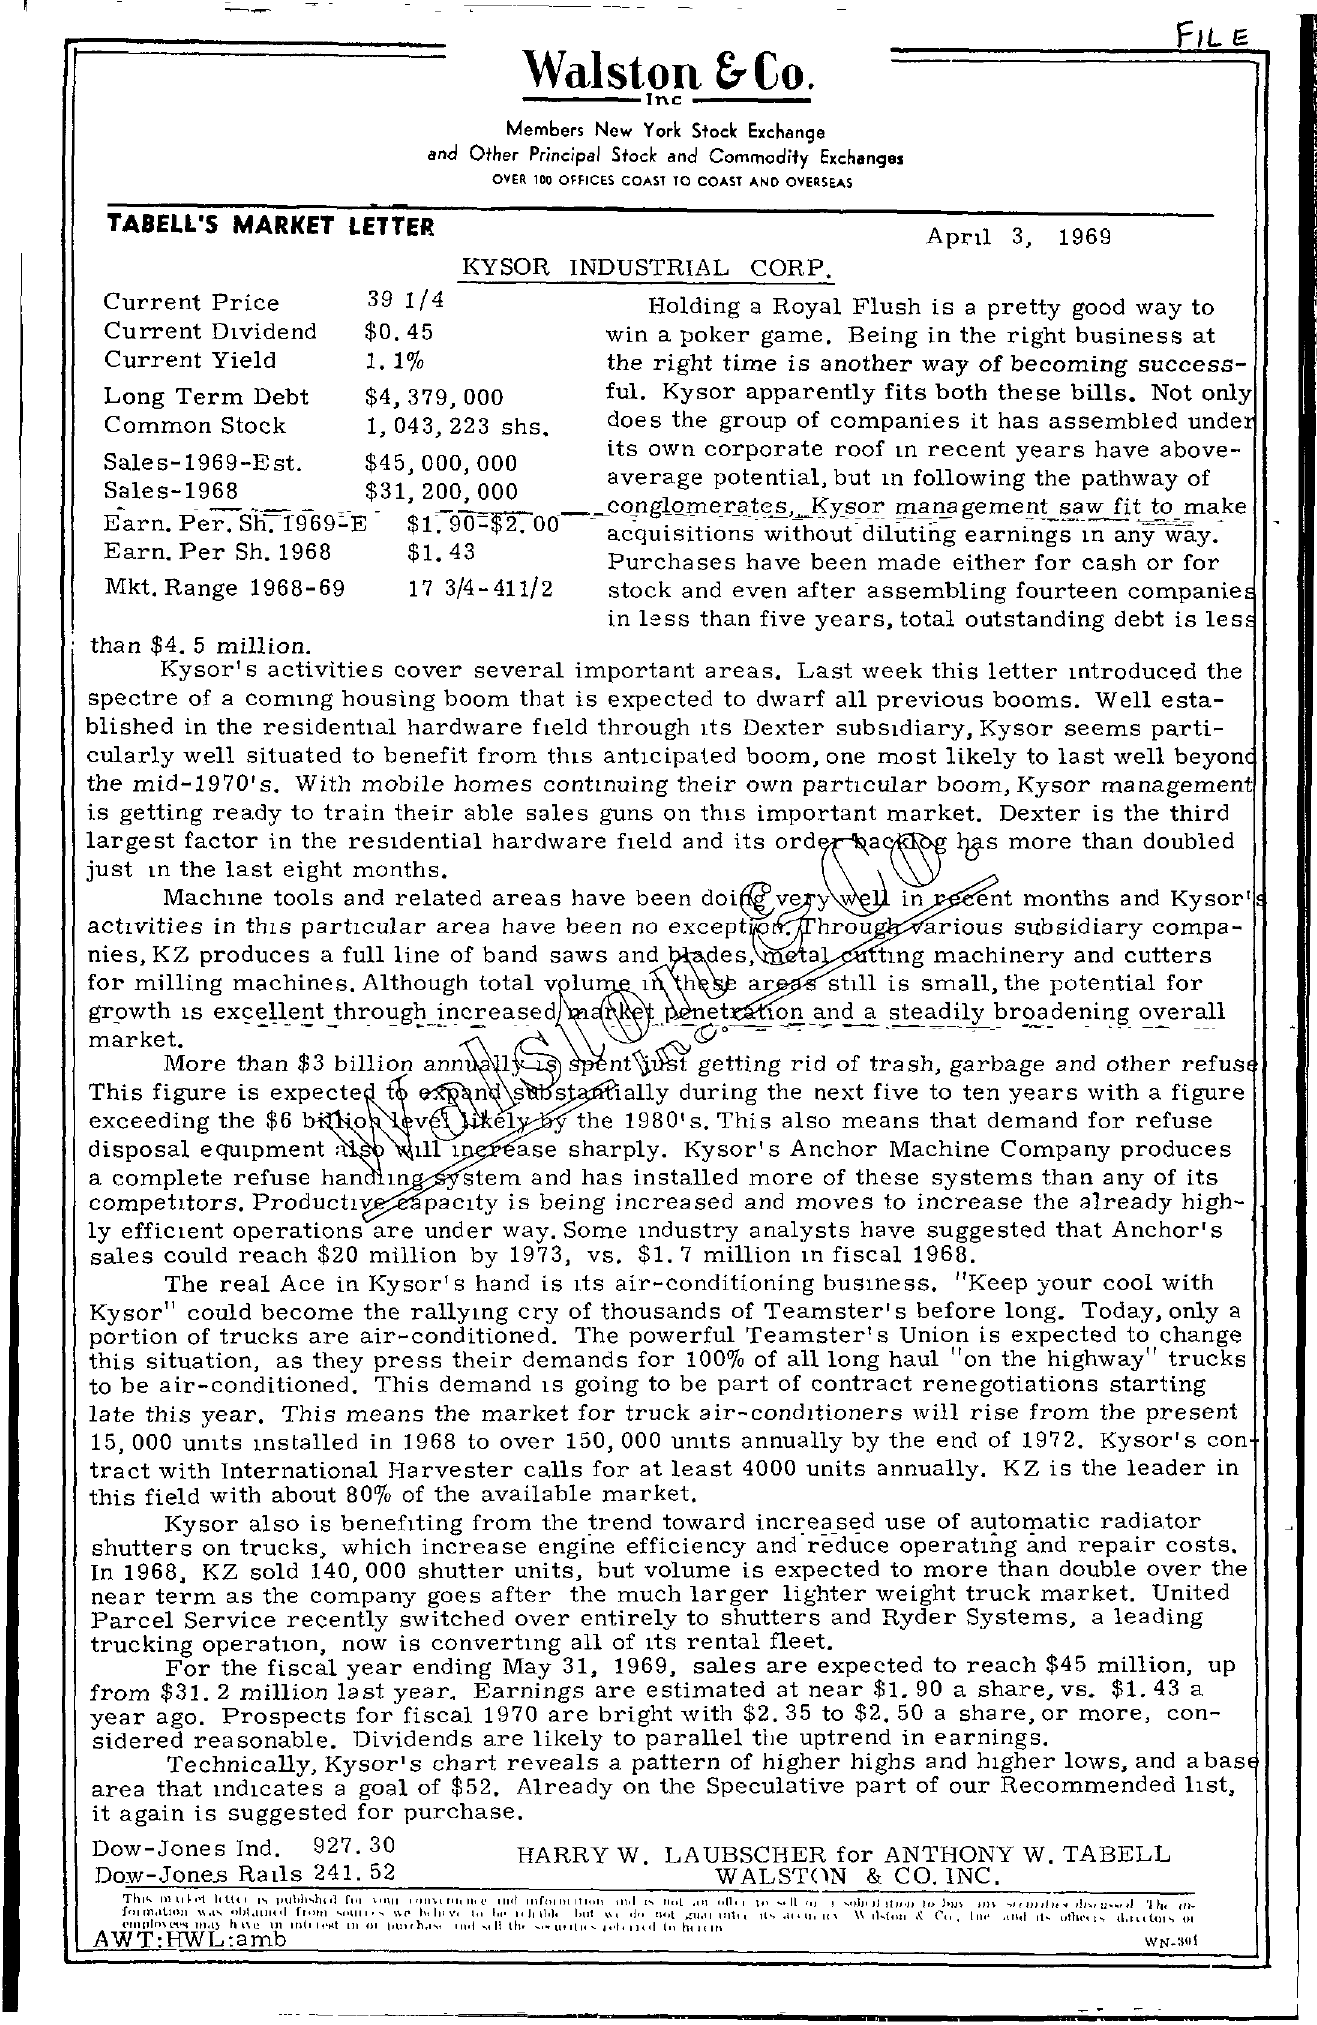 Tabell's Market Letter - April 03, 1969